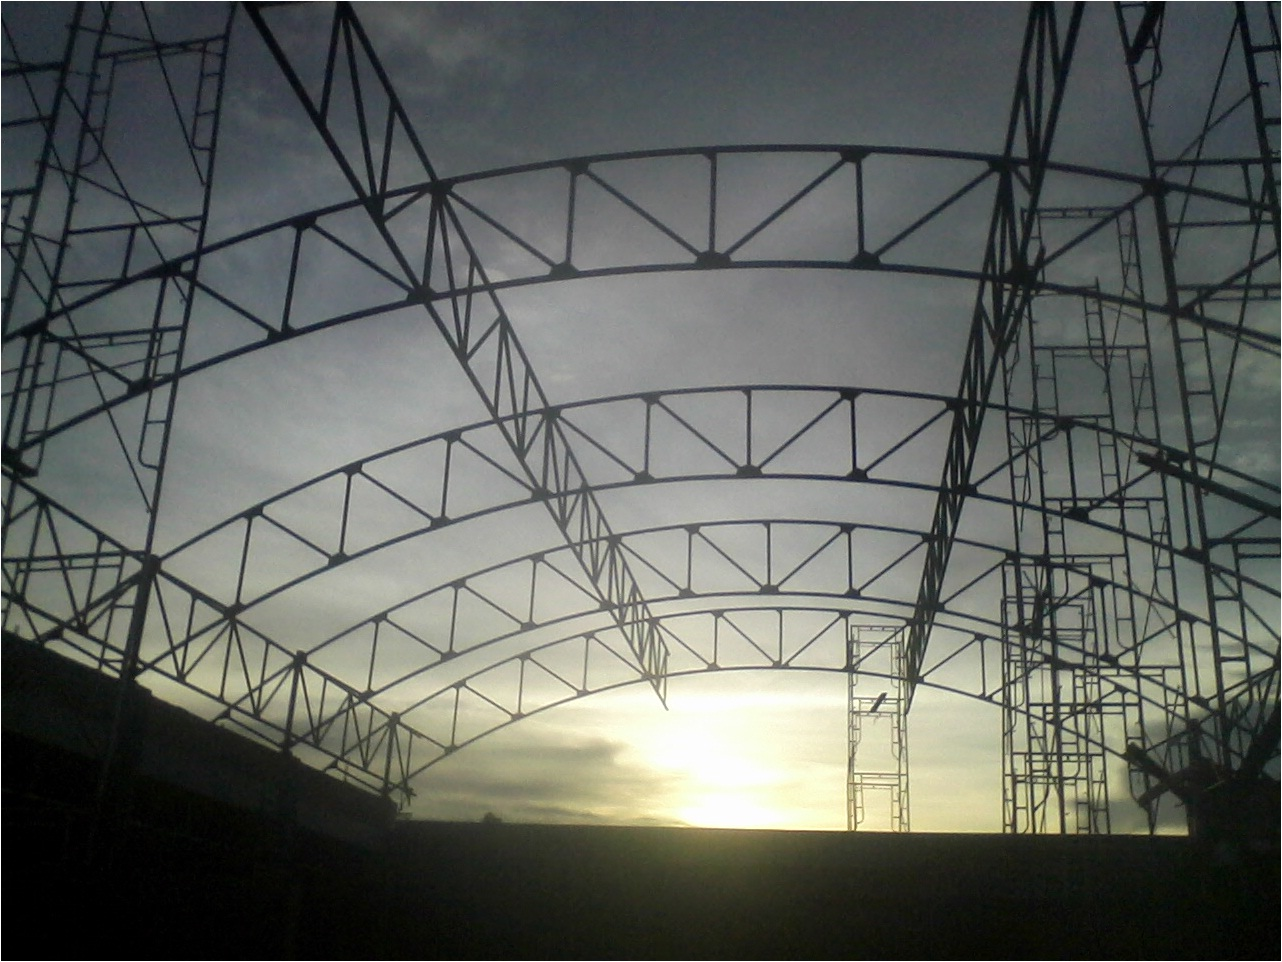 konstruksi besi, baja, berat,atap,lengkung,aula,gedung,gor,stadion